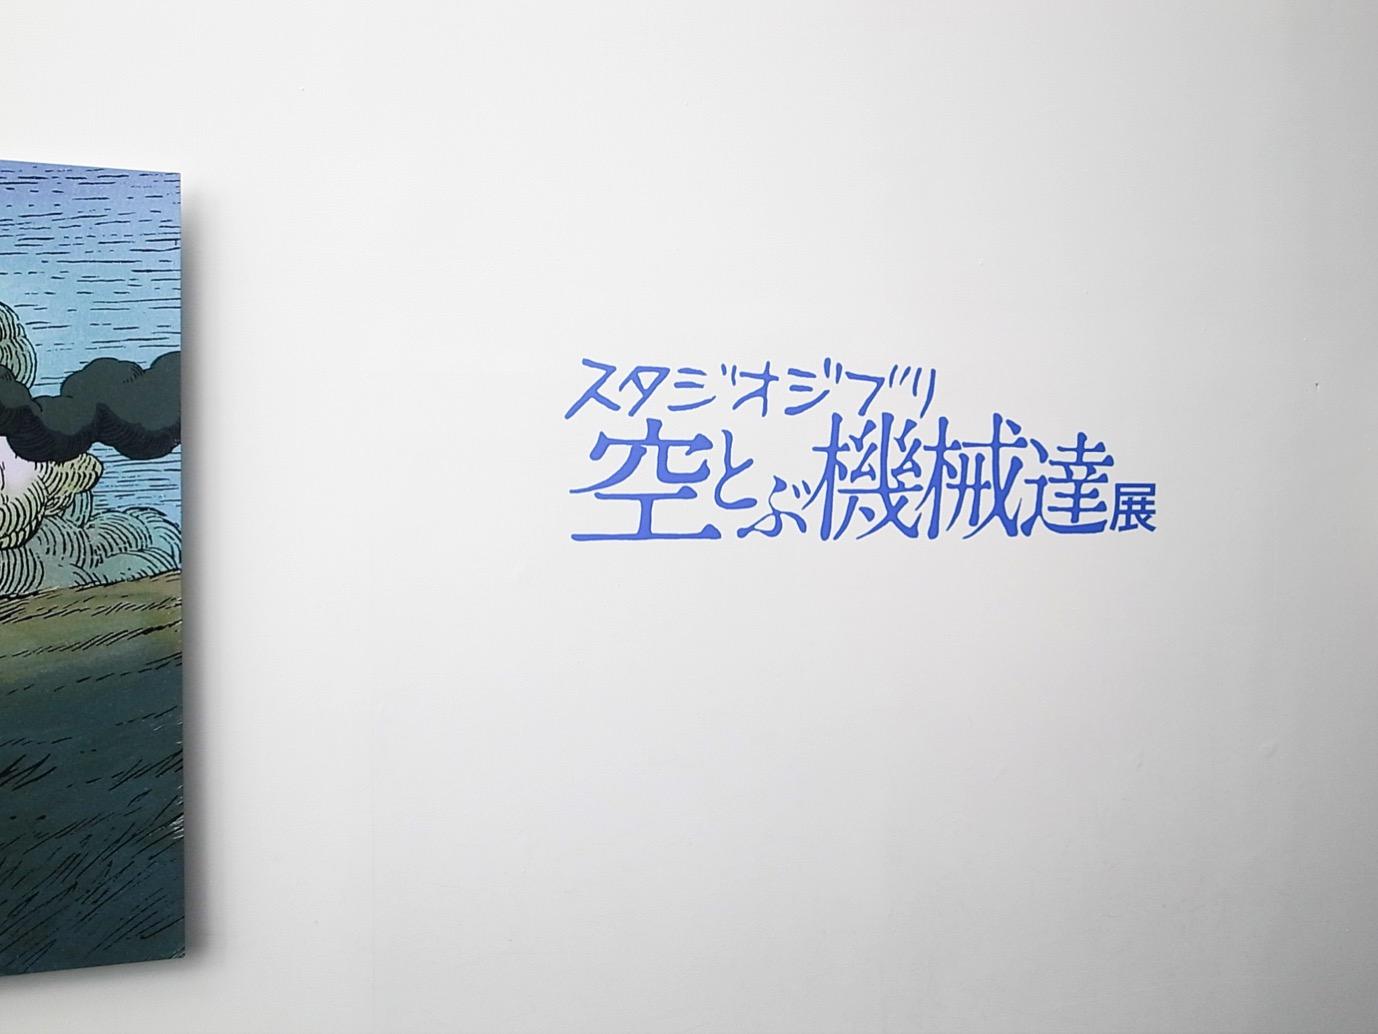 Ghibli expo 2